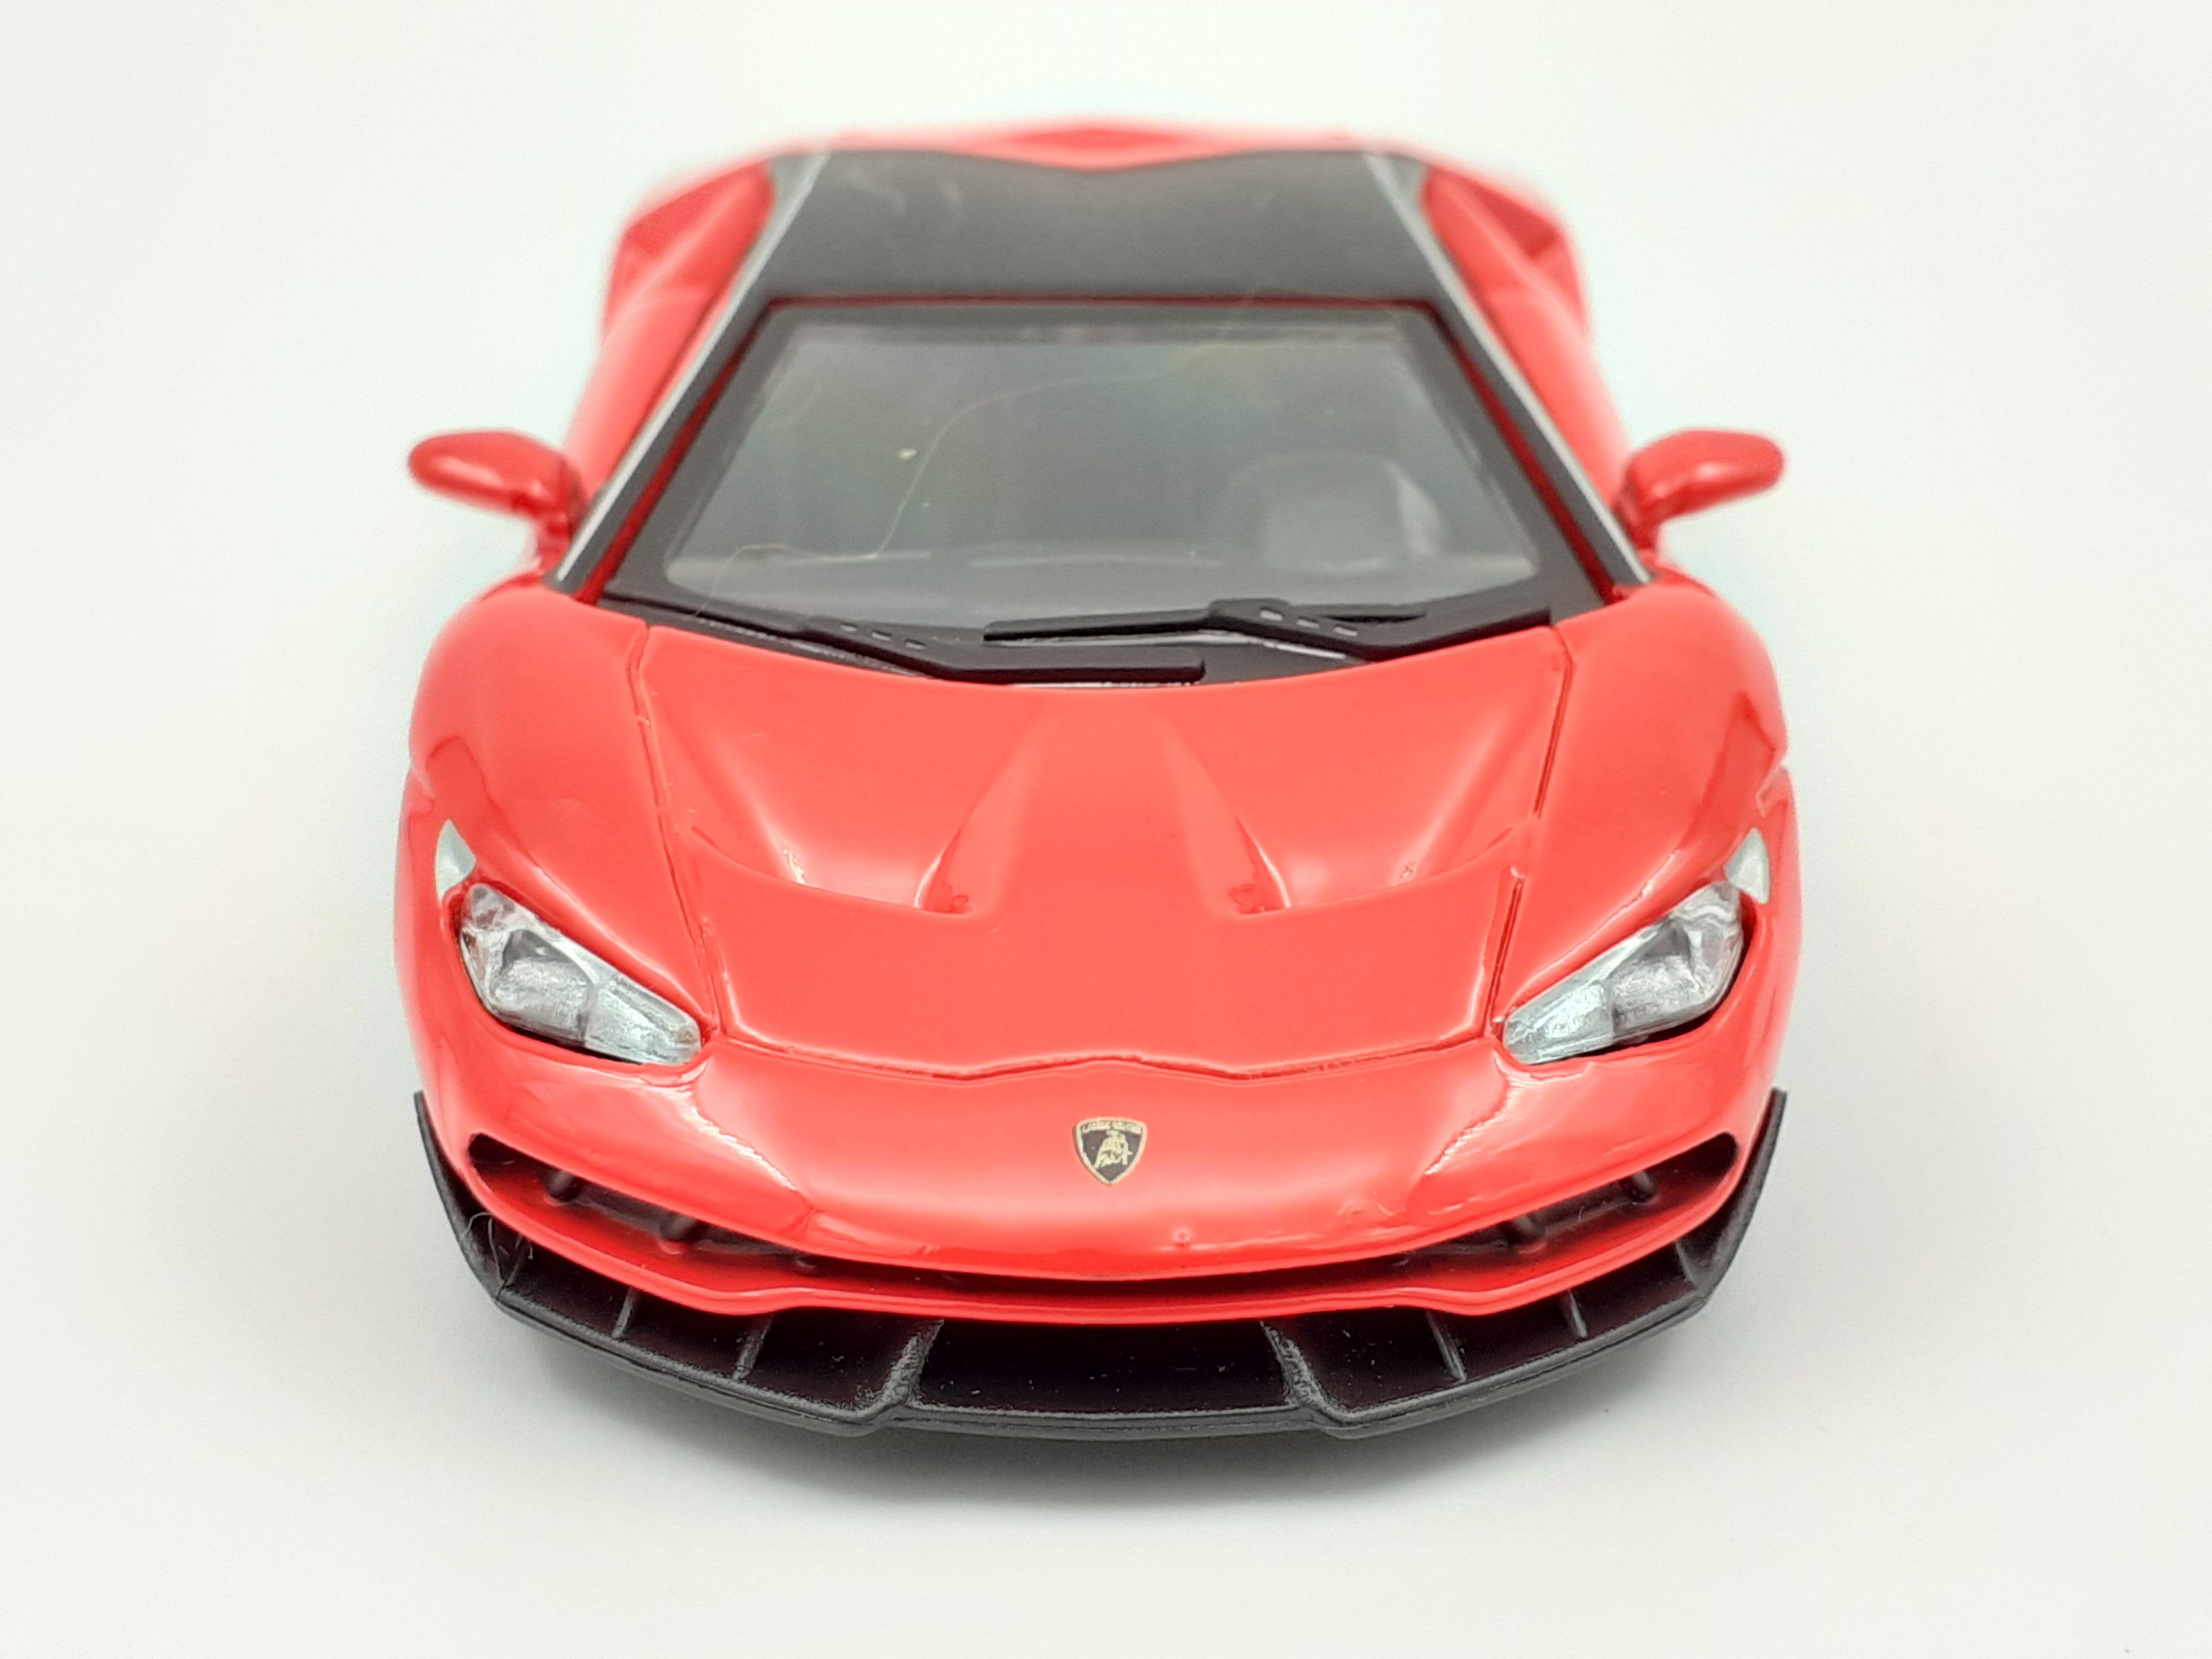 Maisto Lamborghini Centenario 1:43